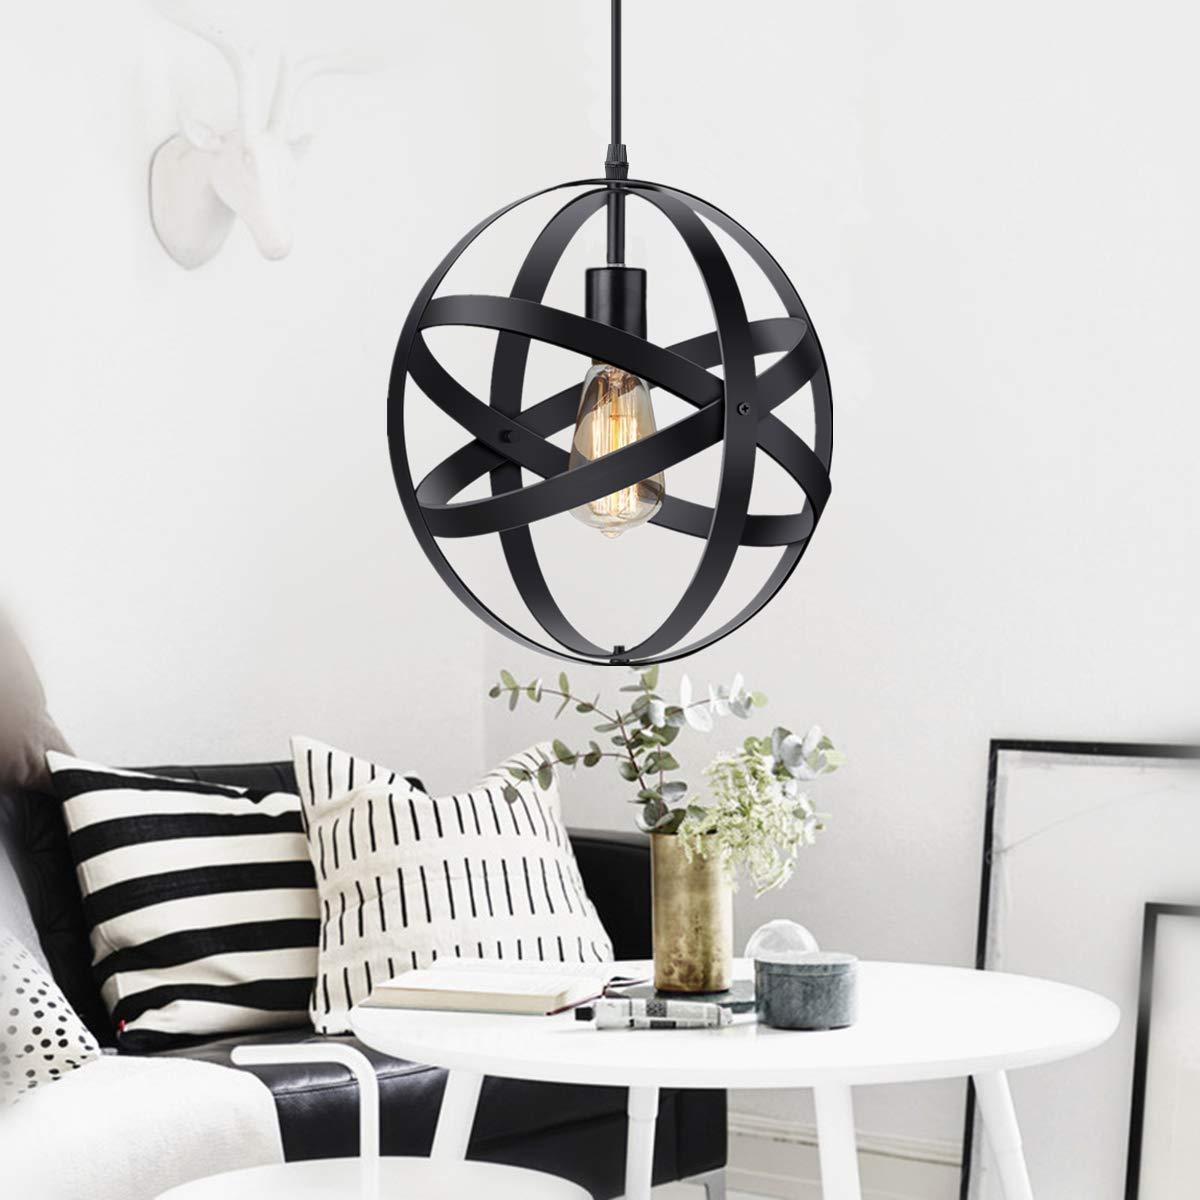 Industrial Metal Spherical Pendant Lights Displays Changeable Hanging Light Fixture Home Decor Rustic Vintage Edison Cord Lamp